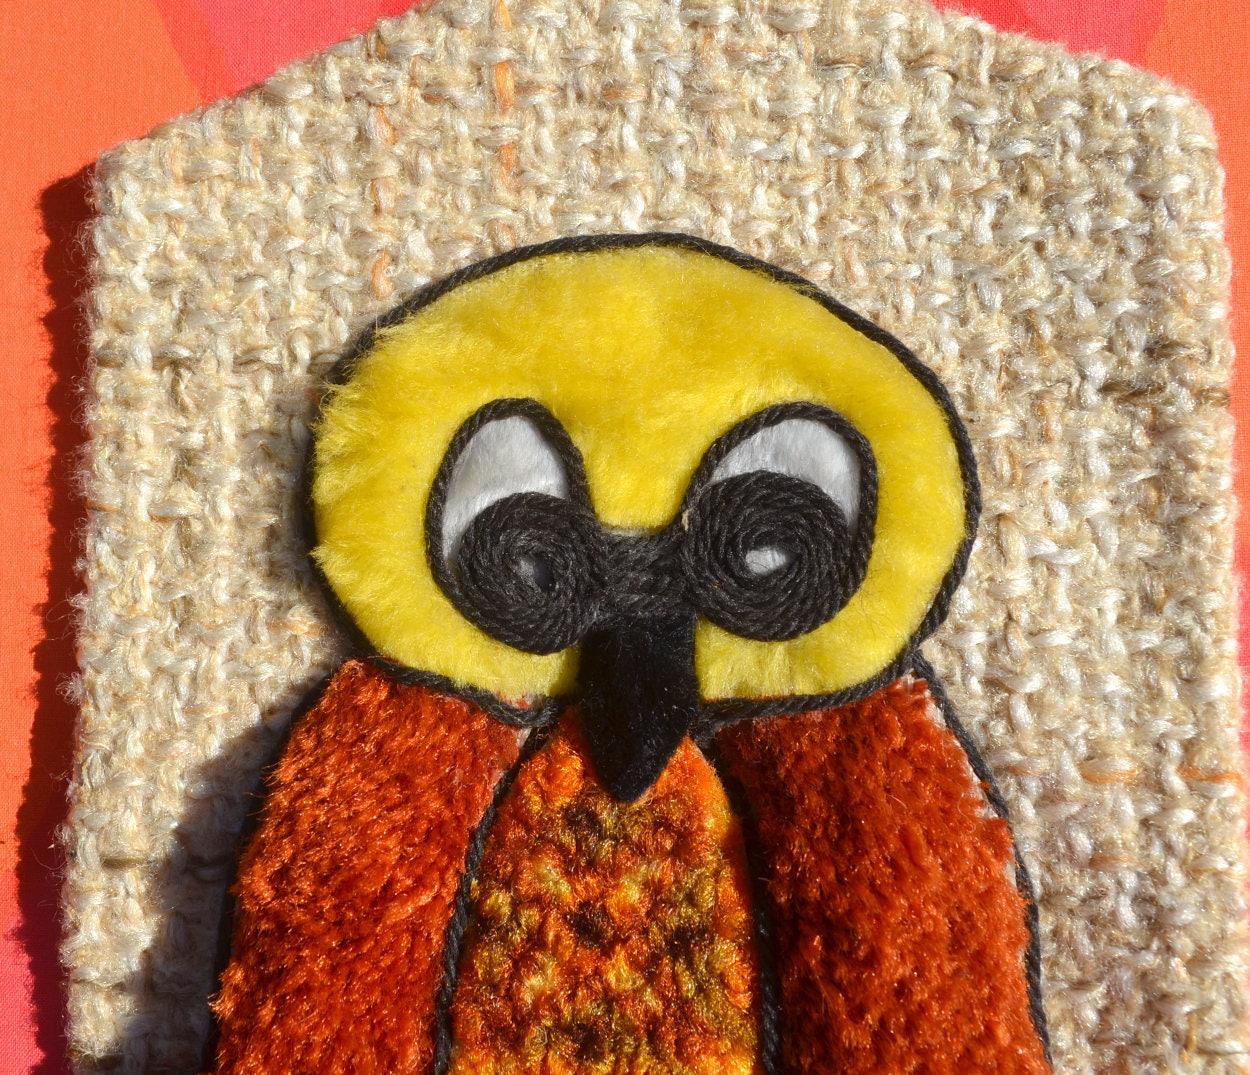 vintage 70s art wall hanging OWL retro latch hook woven animal decor ...